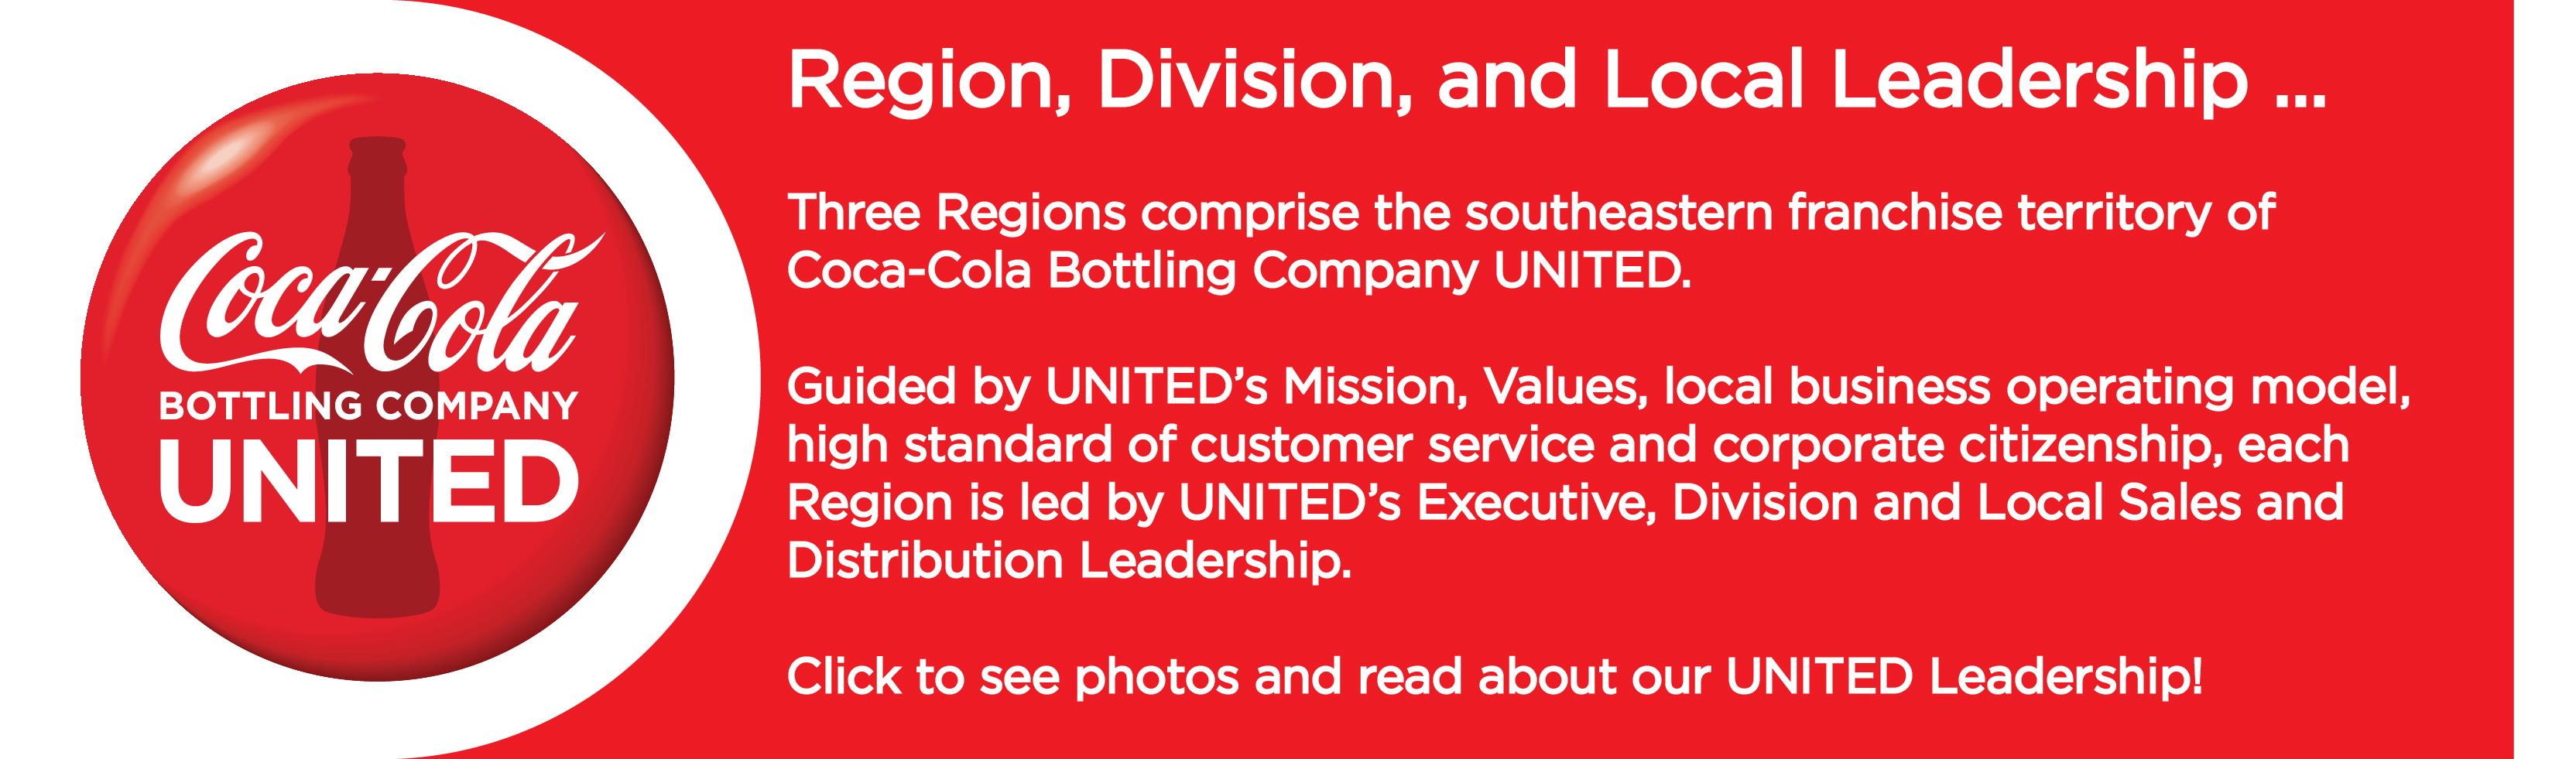 UNITED Leadership, Region, Division